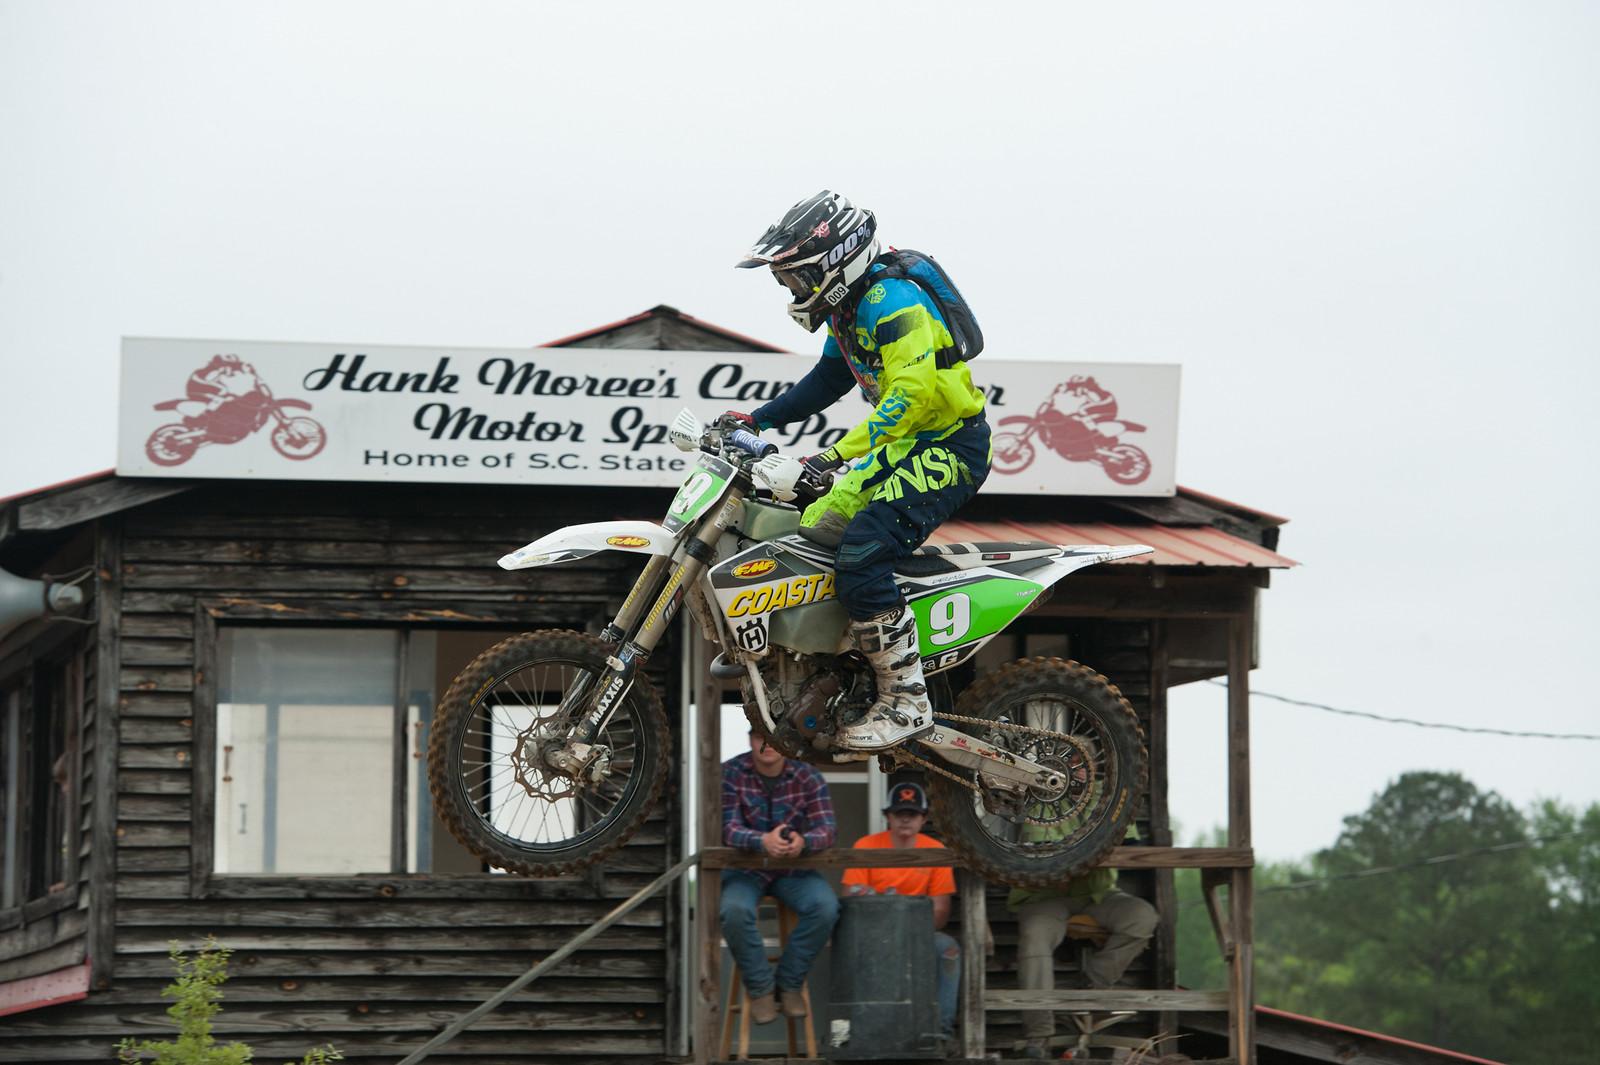 Craig DeLong - GuyB - Motocross Pictures - Vital MX